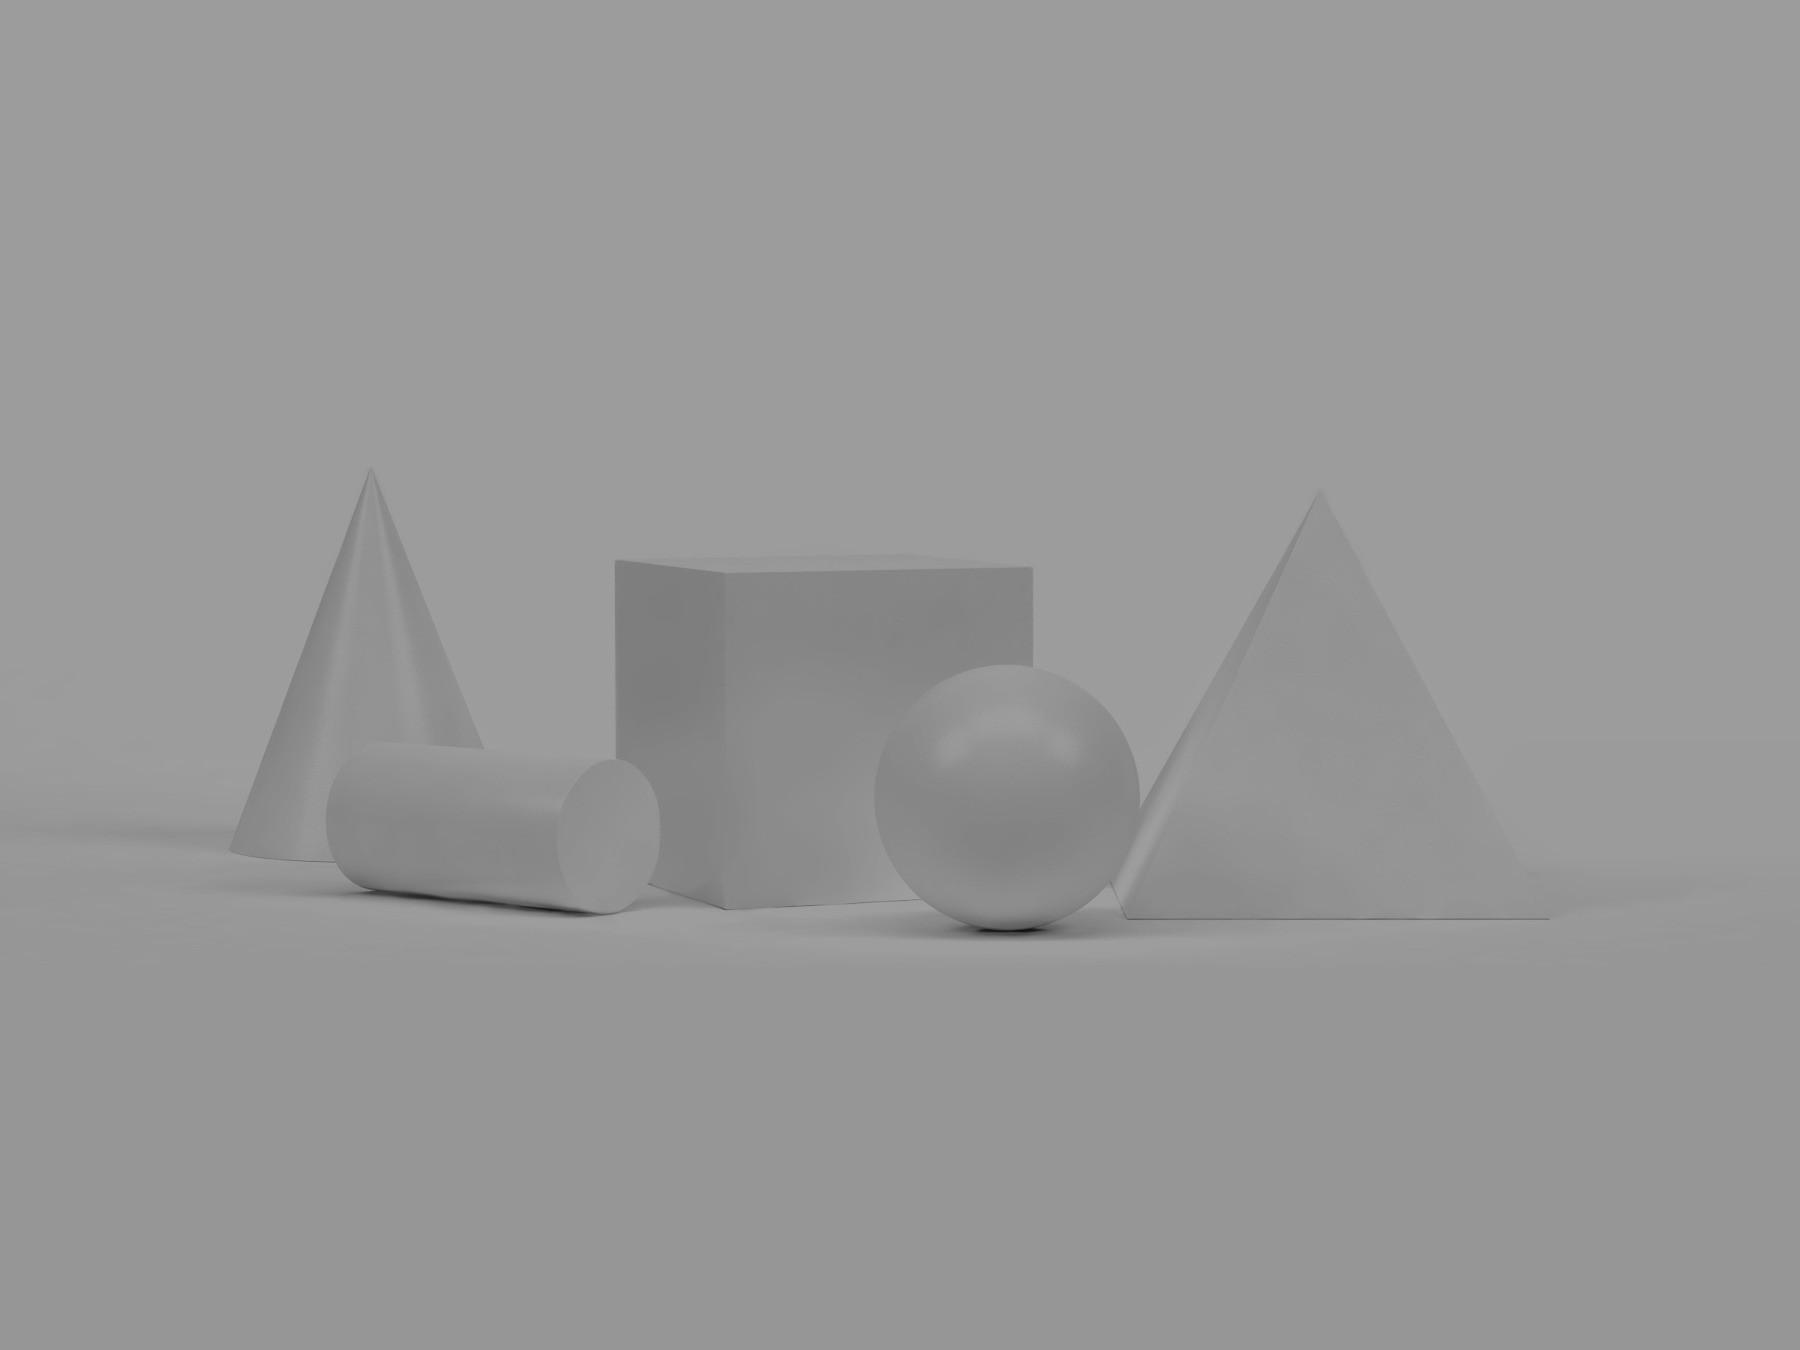 White%2520geometrical%2520Shapes_edited_